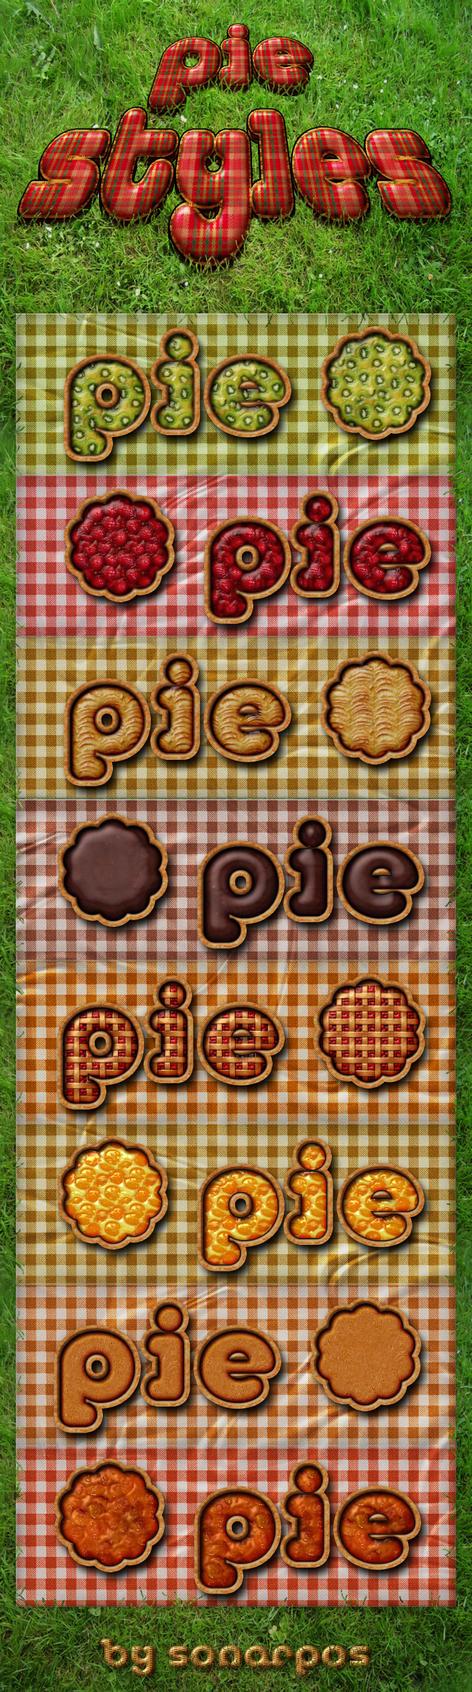 Pie styles by sonarpos